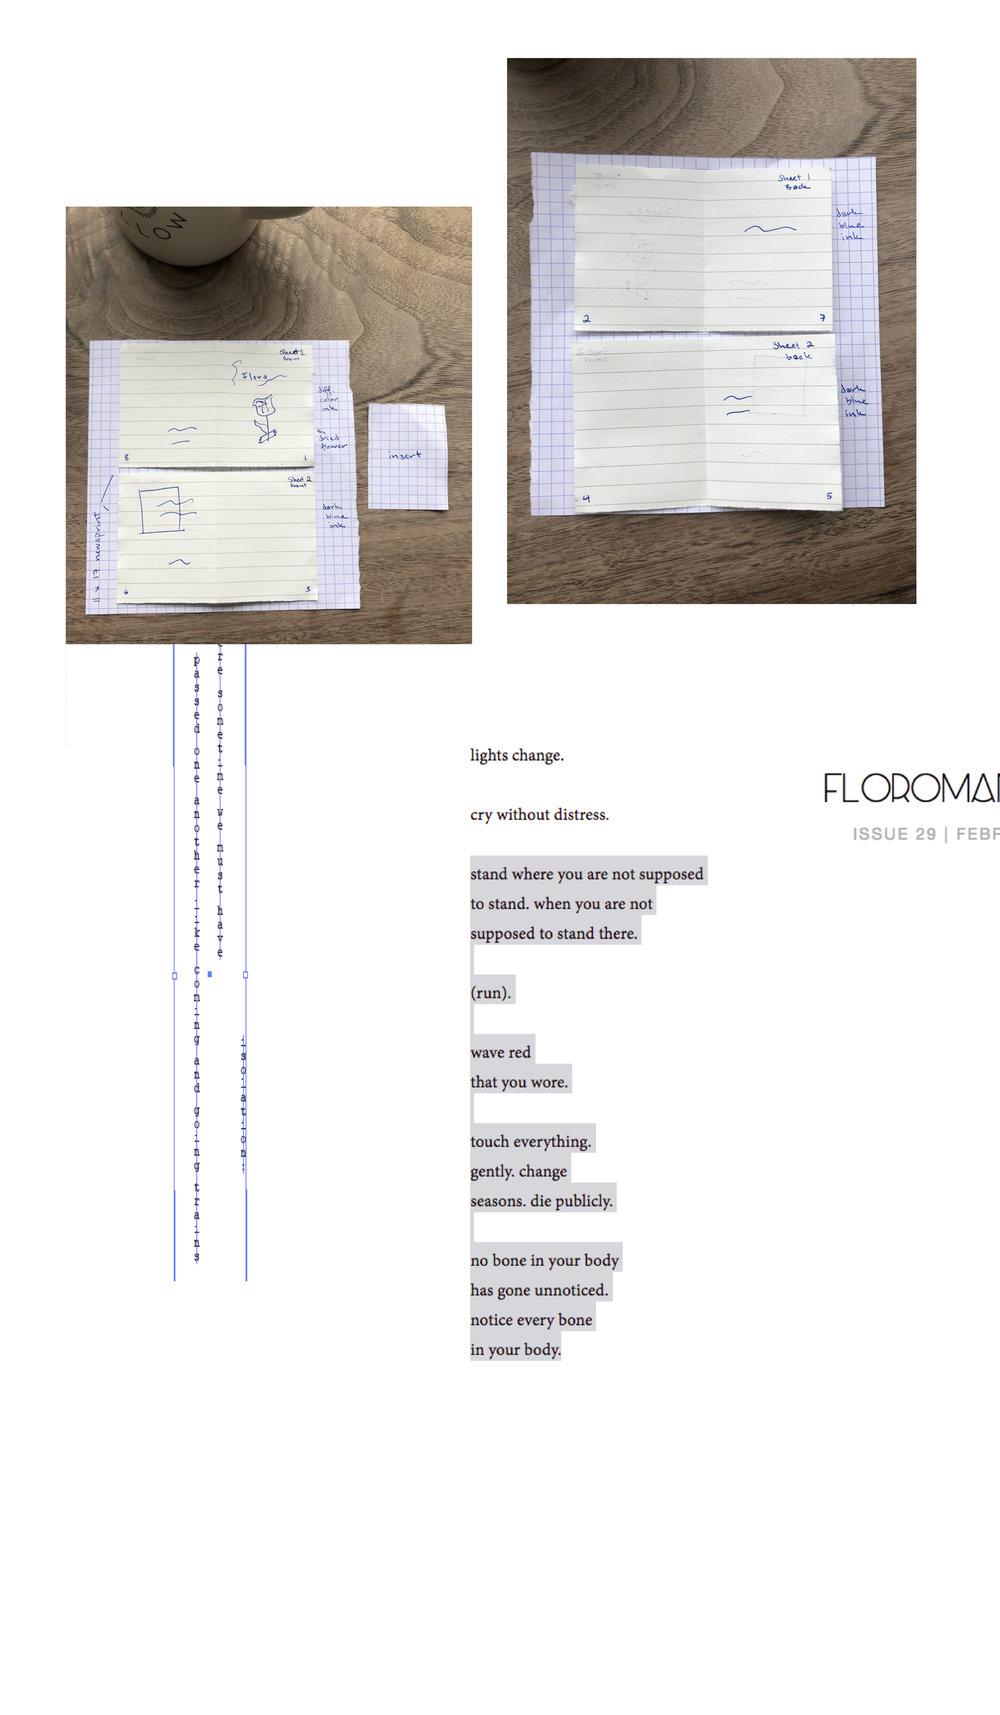 floro_1 copy.jpg